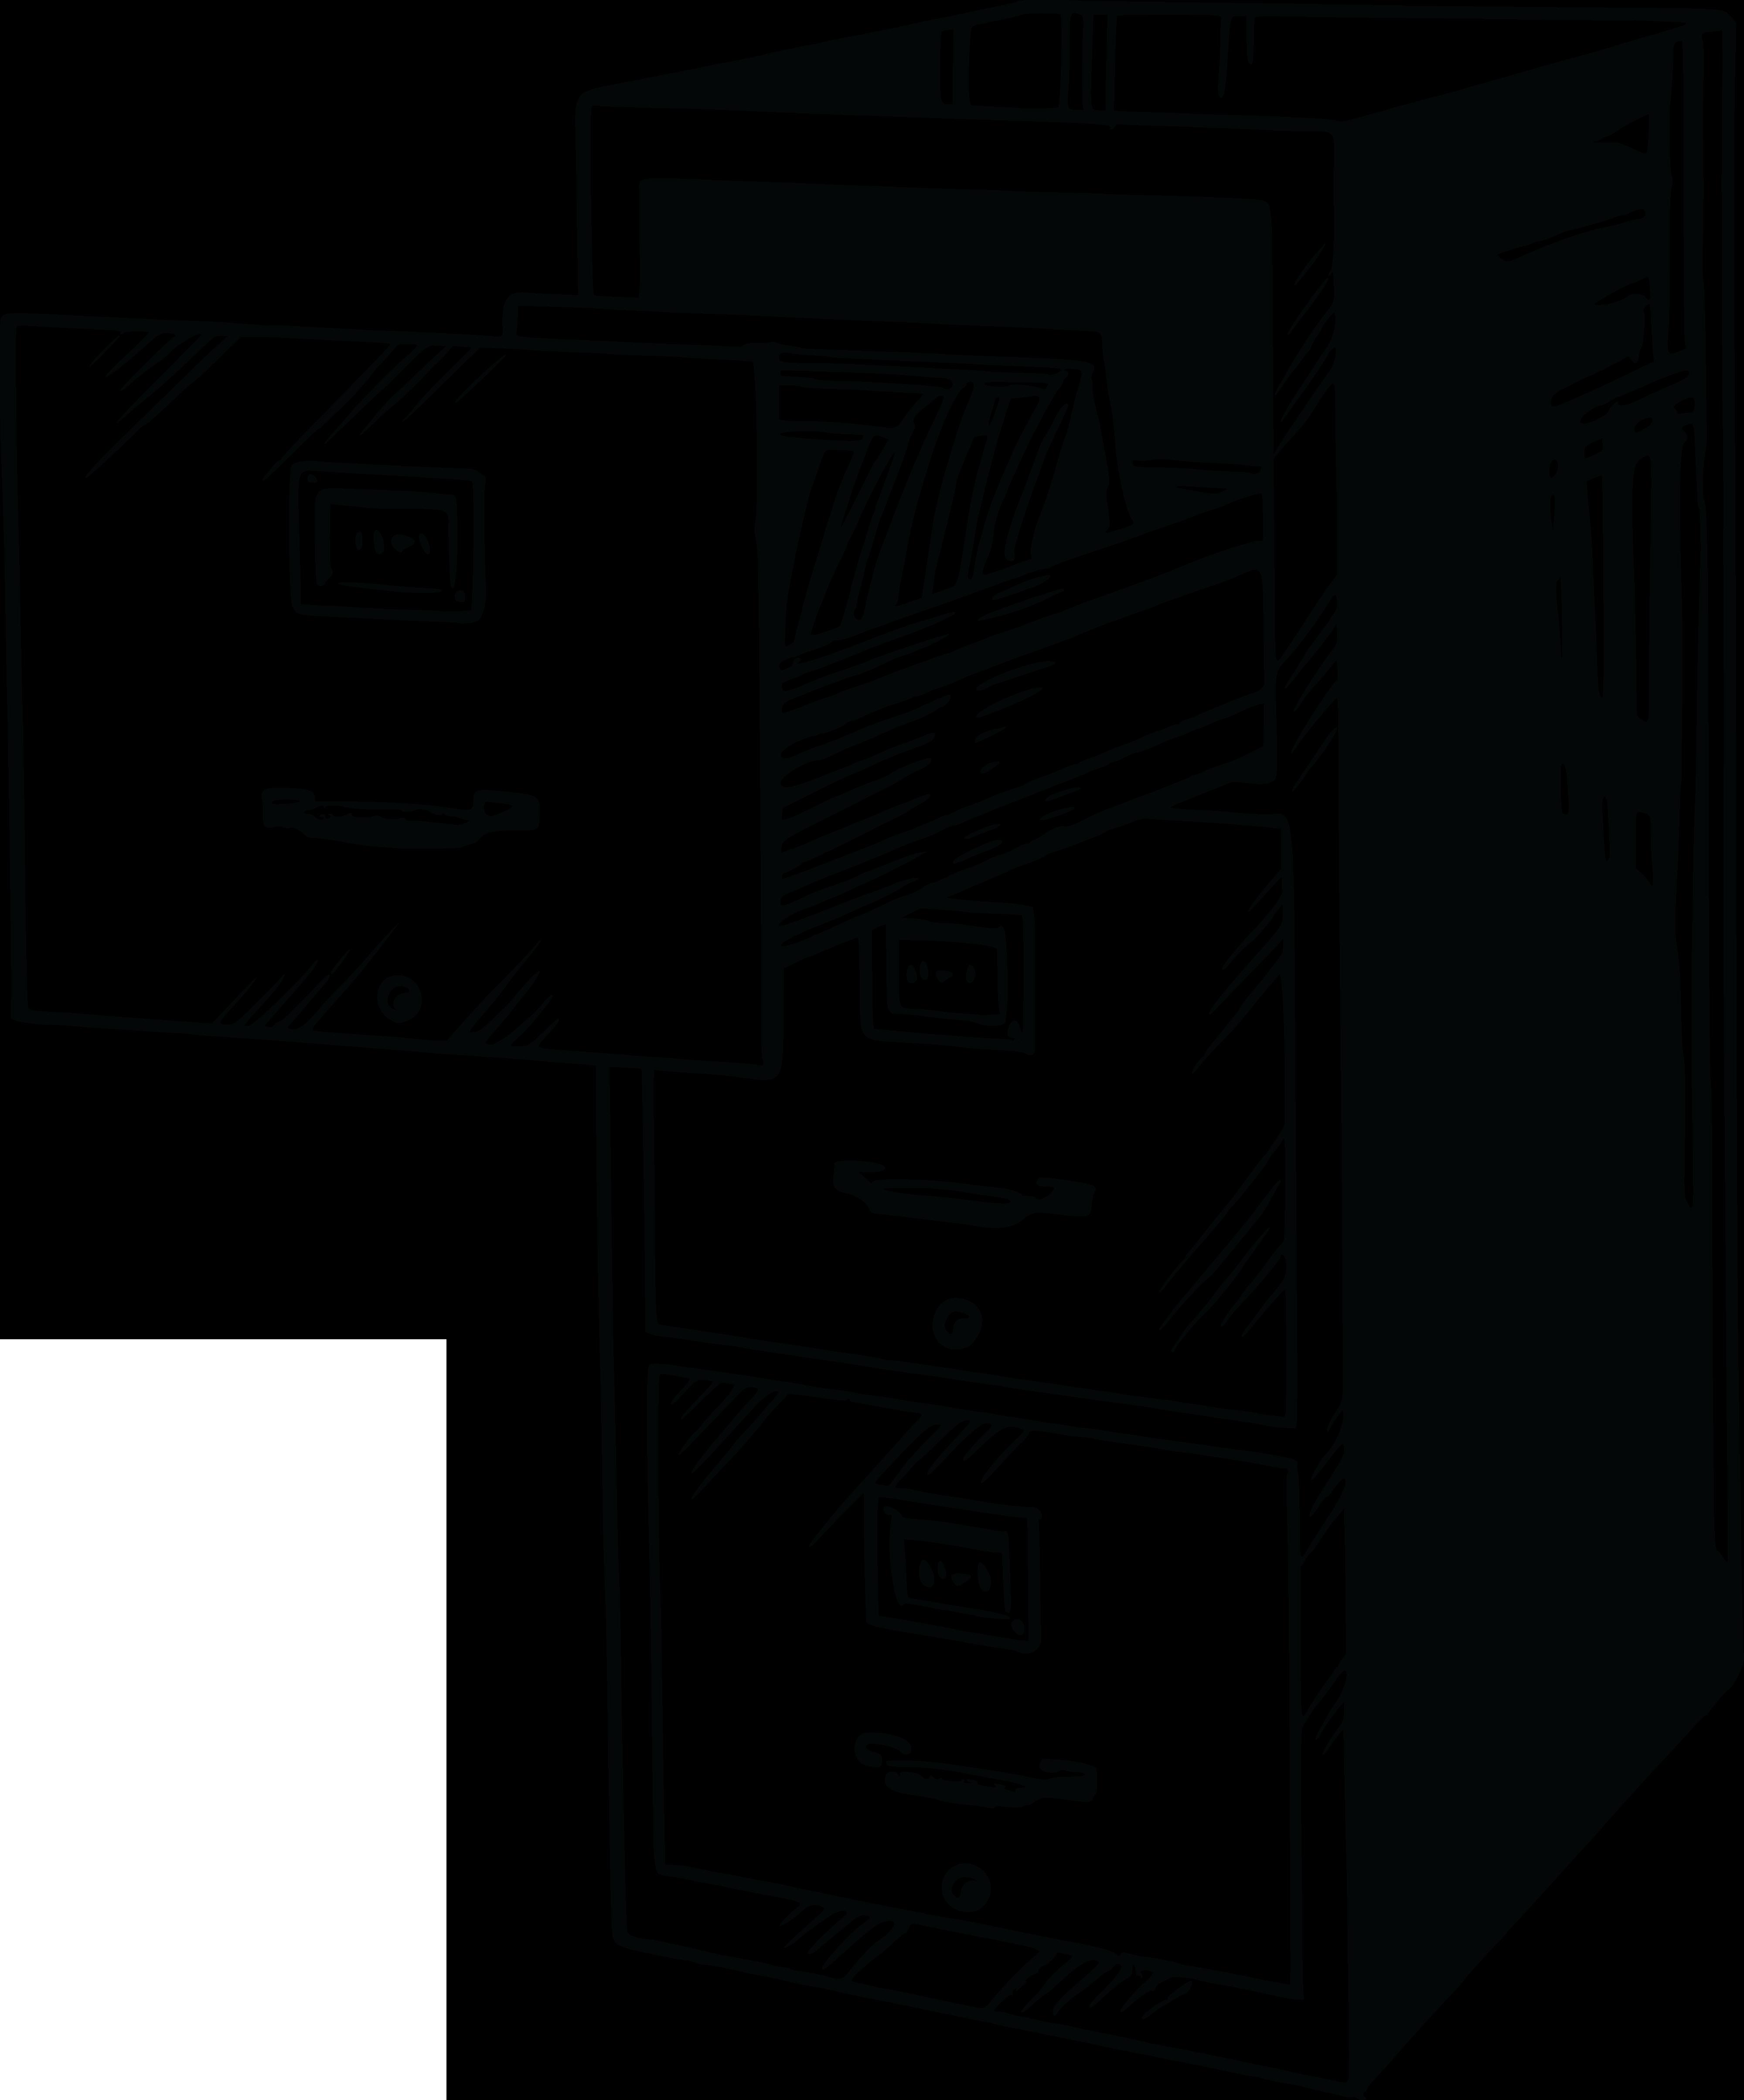 Kitchen Door Clip Art: Free Clipart: JPG, PNG, EPS, AI, SVG, CDR